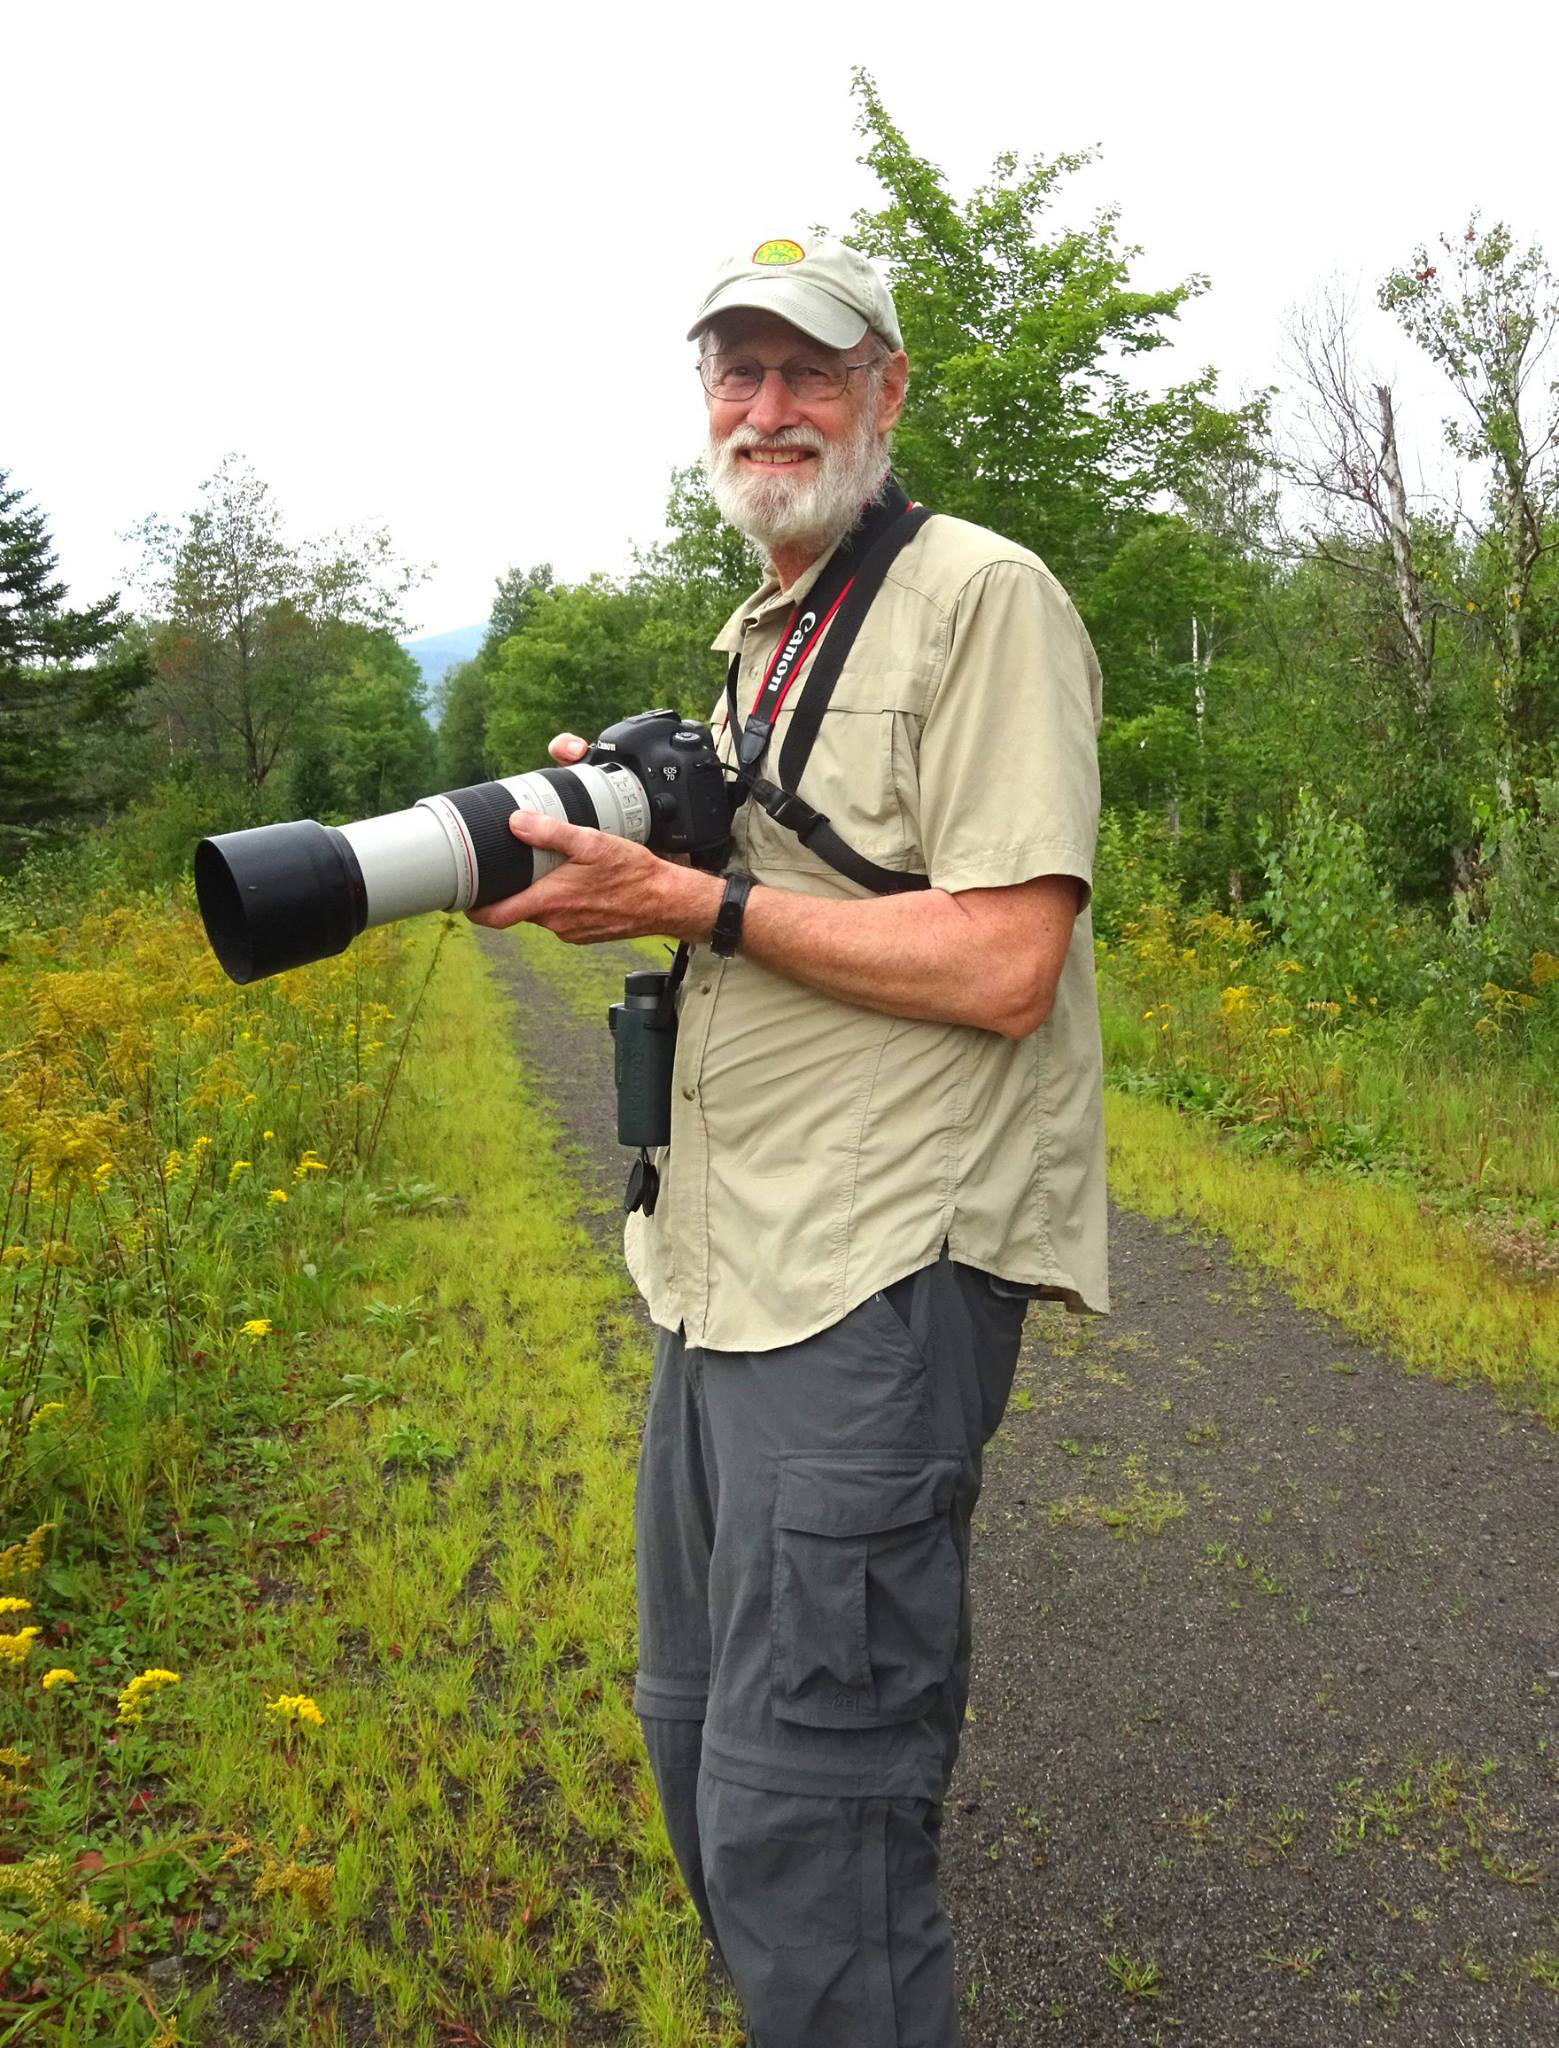 Birder-Photographer Dave Forsyth 26 Aug 2016